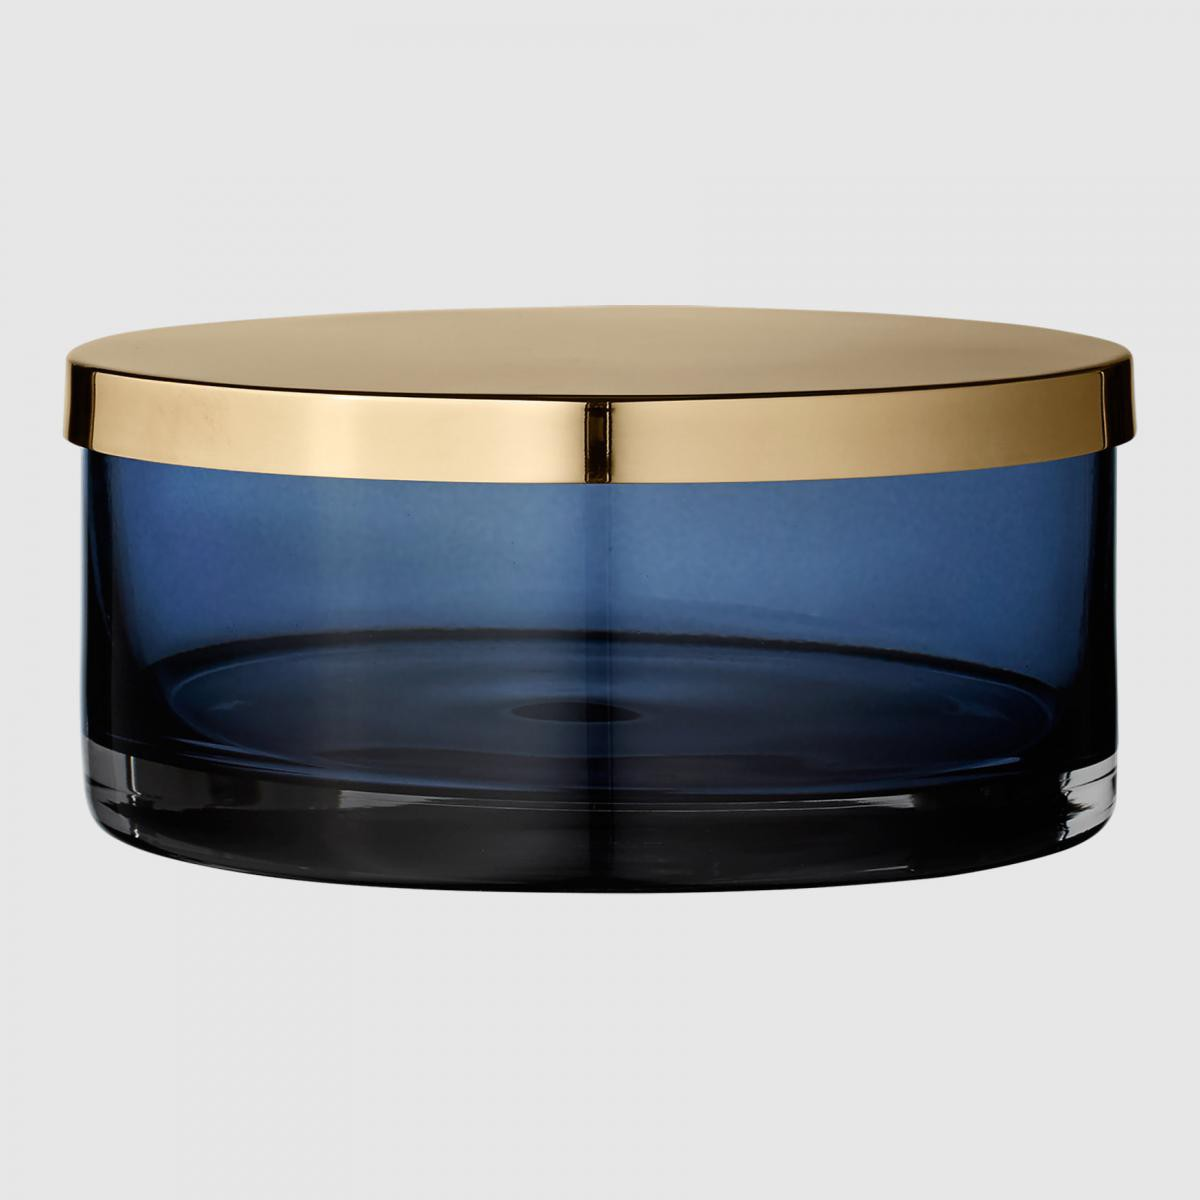 Aytm Boîte Tota cylindrique - bleu foncé - L